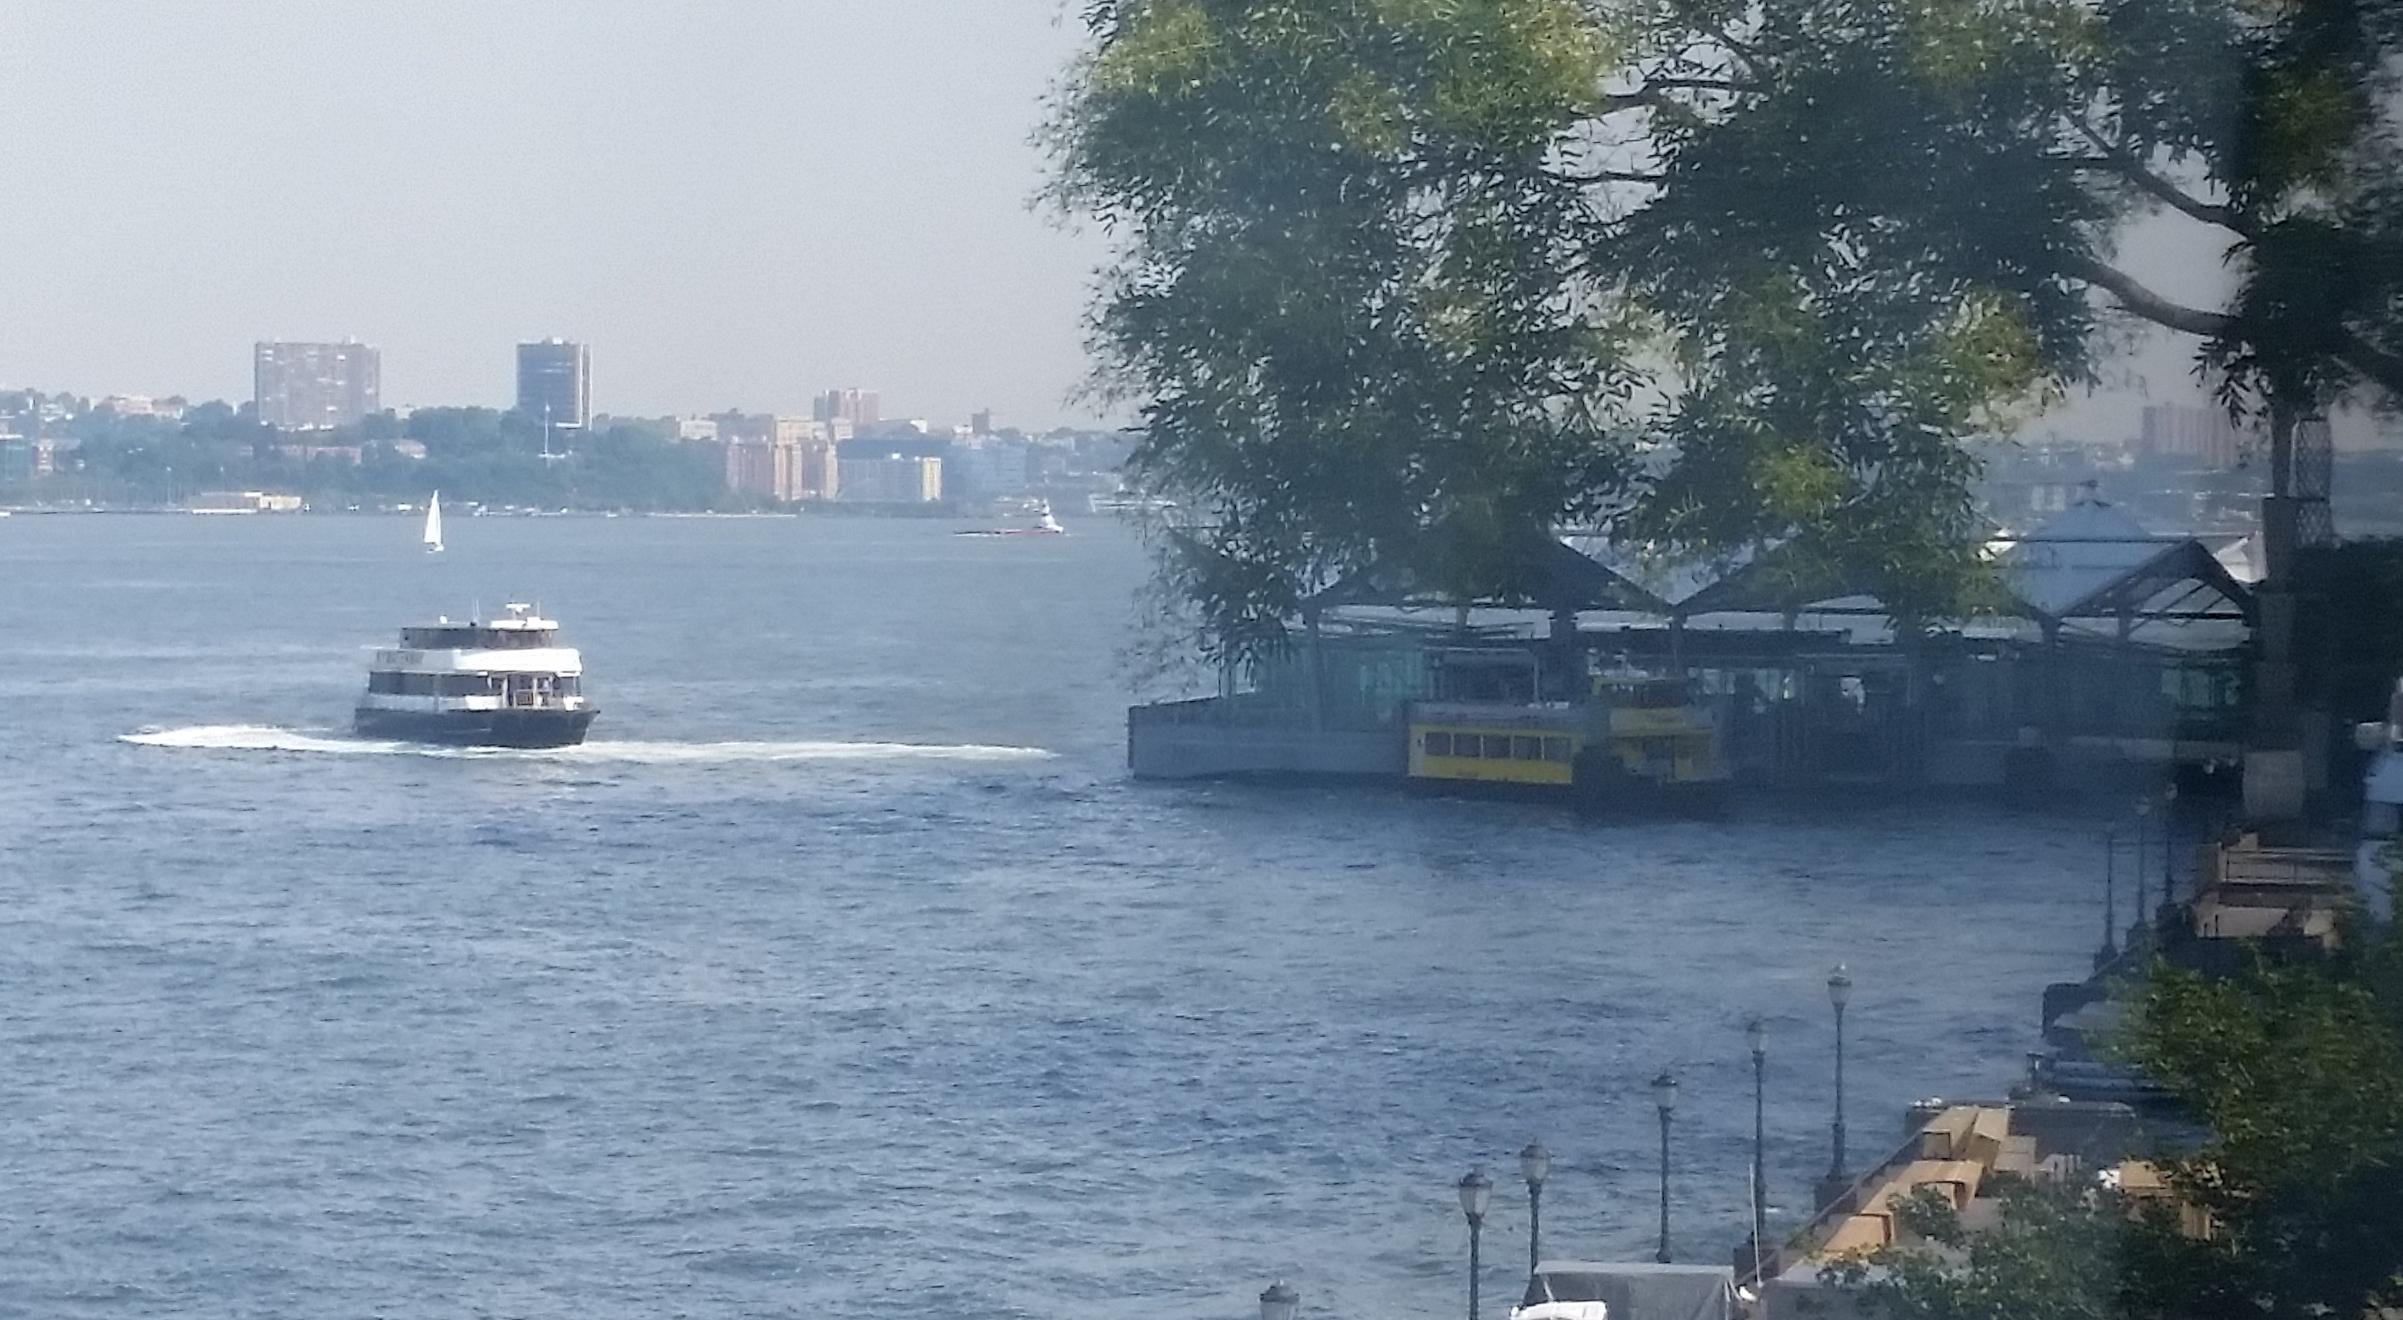 Ferry stuck 2